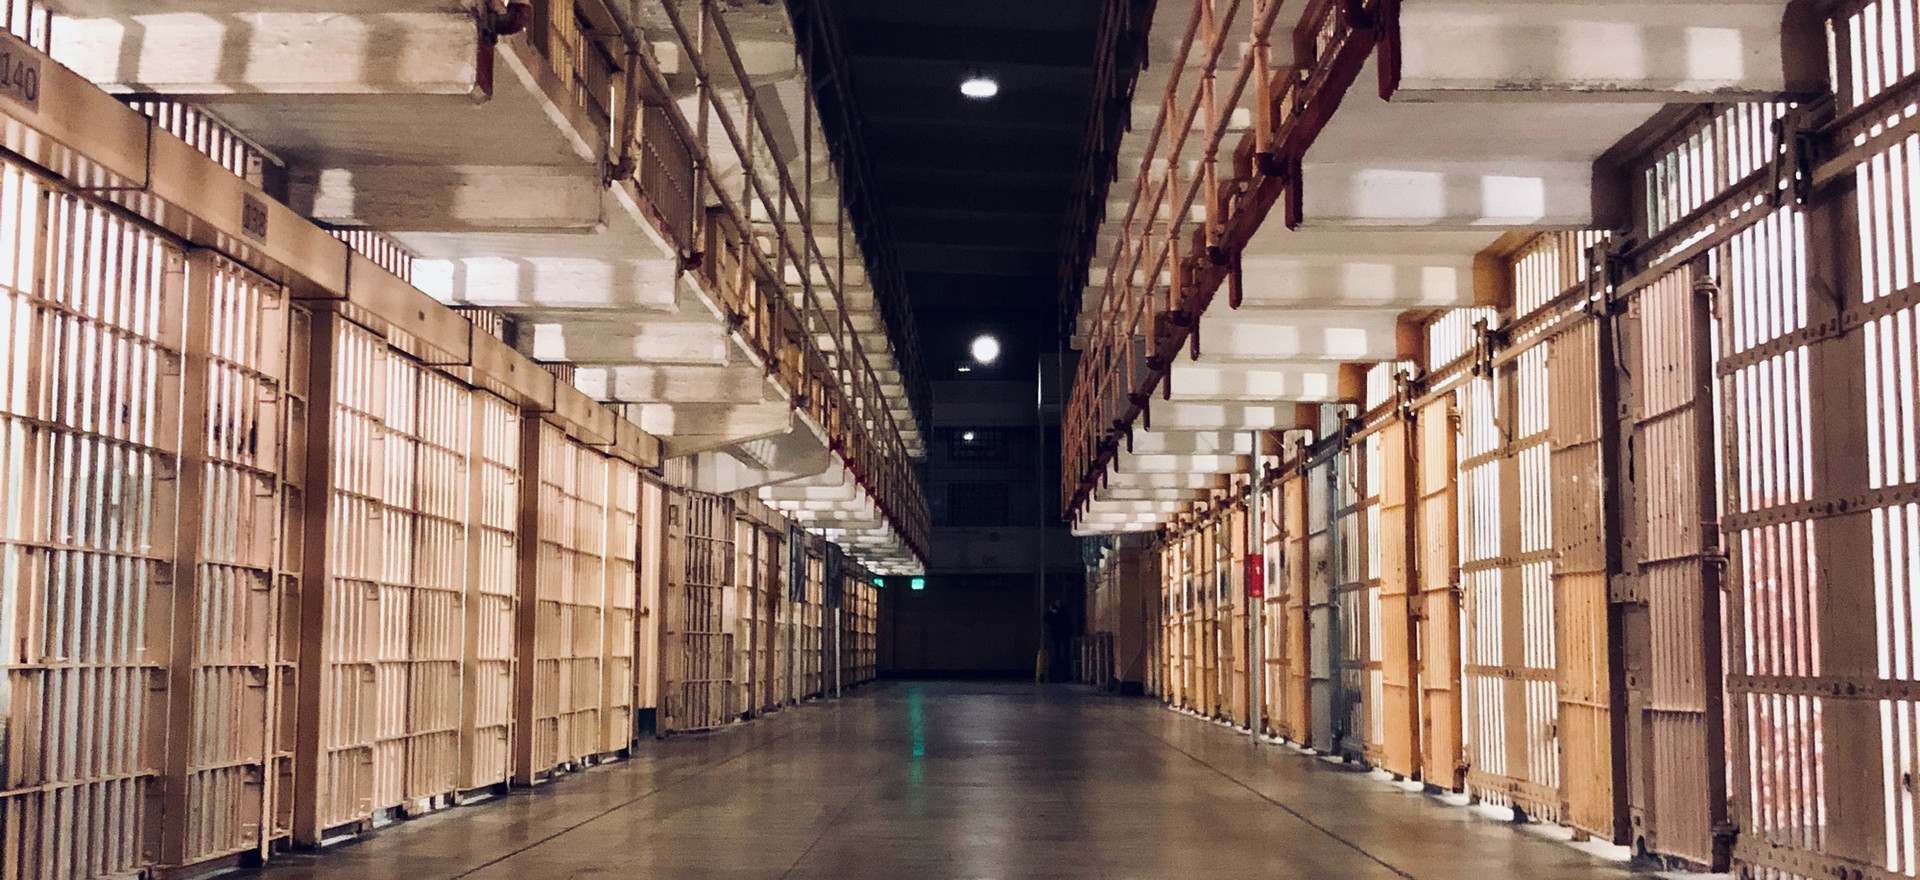 Central OC Jail